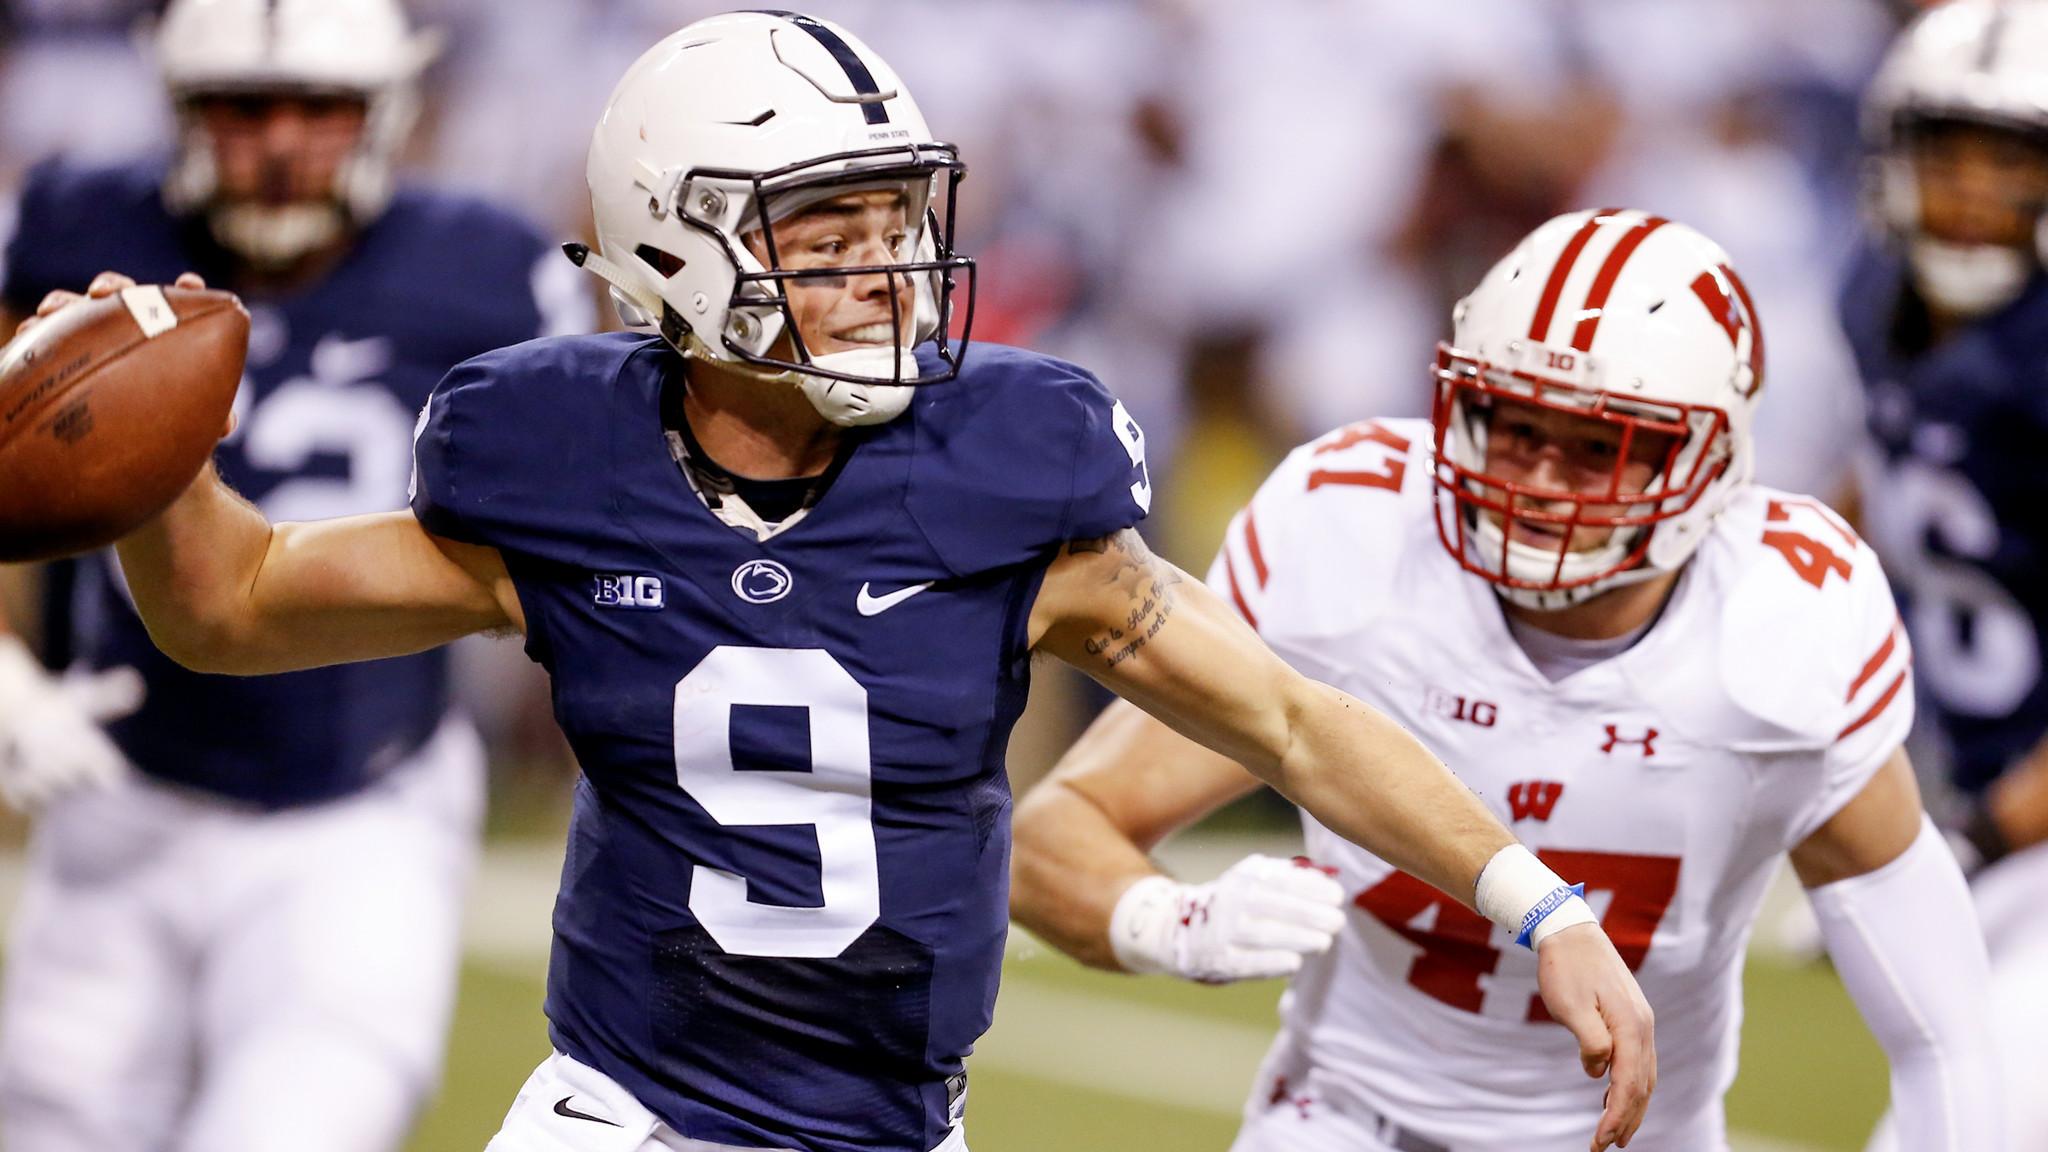 Penn State quarterback may not pass 'eyeball test,' but talent runs deep –  LA Times